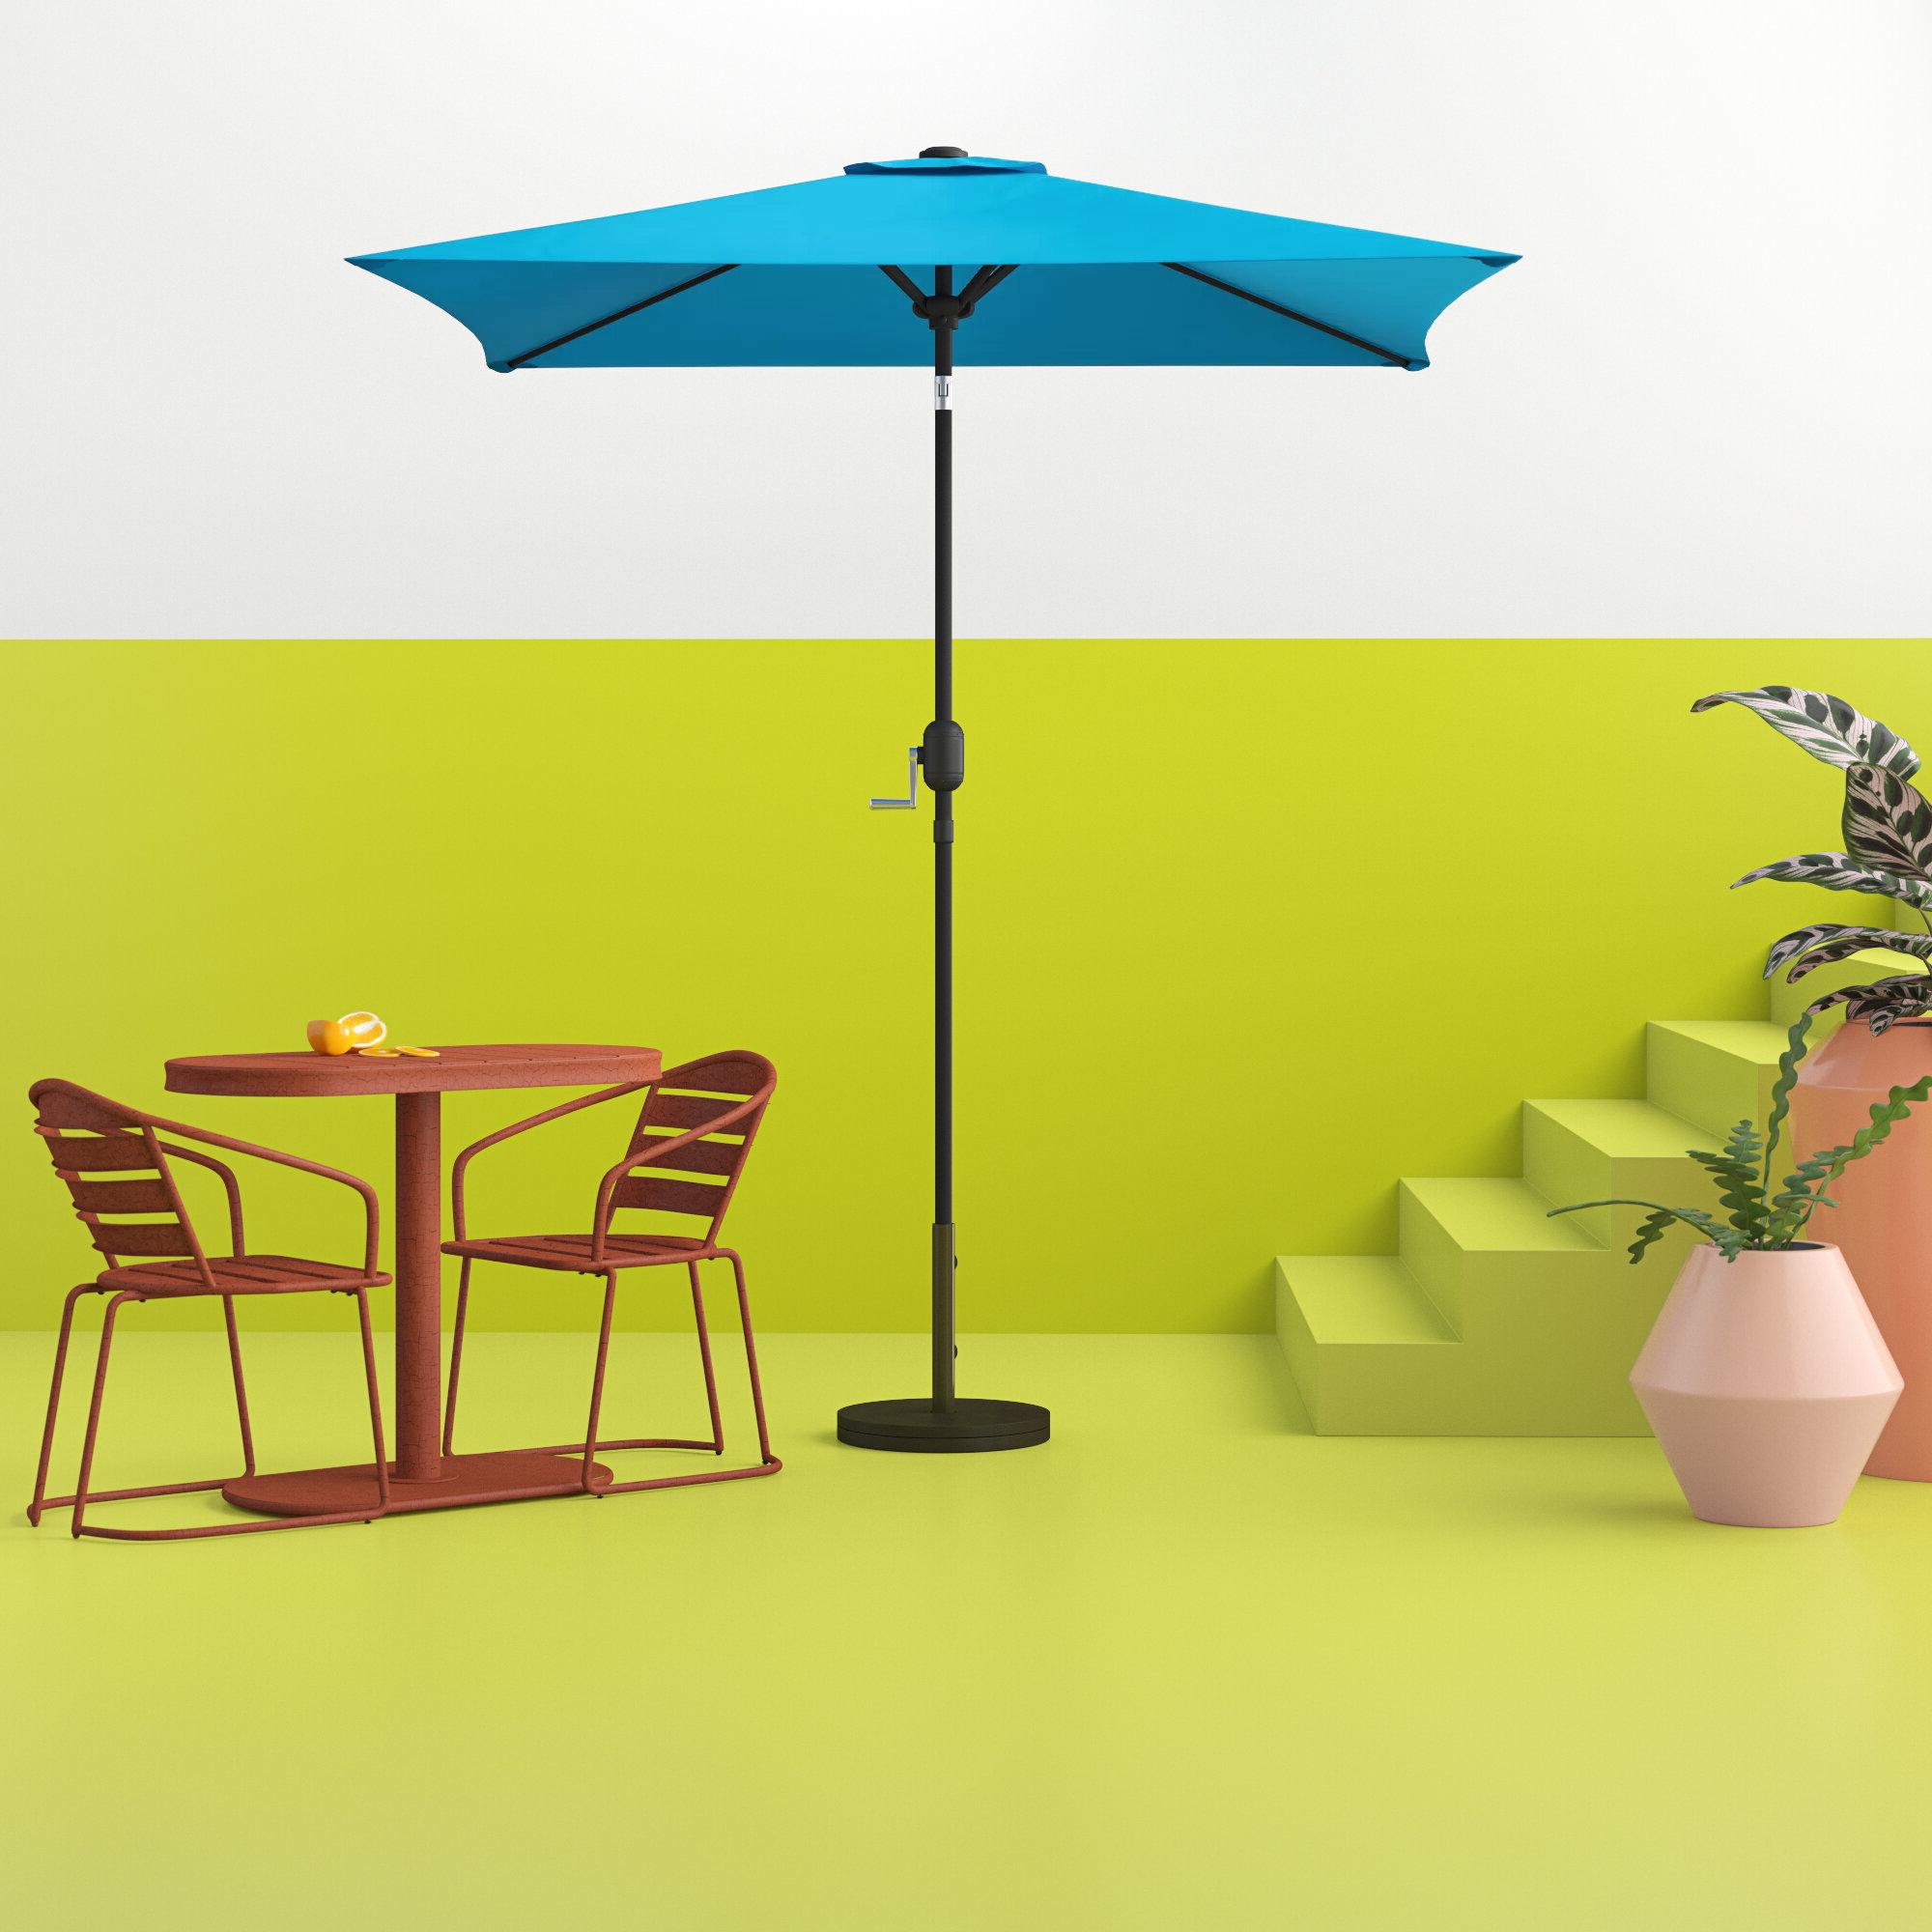 2019 Bradford Patiosquare Market Umbrellas Pertaining To Bradford Patio (View 2 of 20)